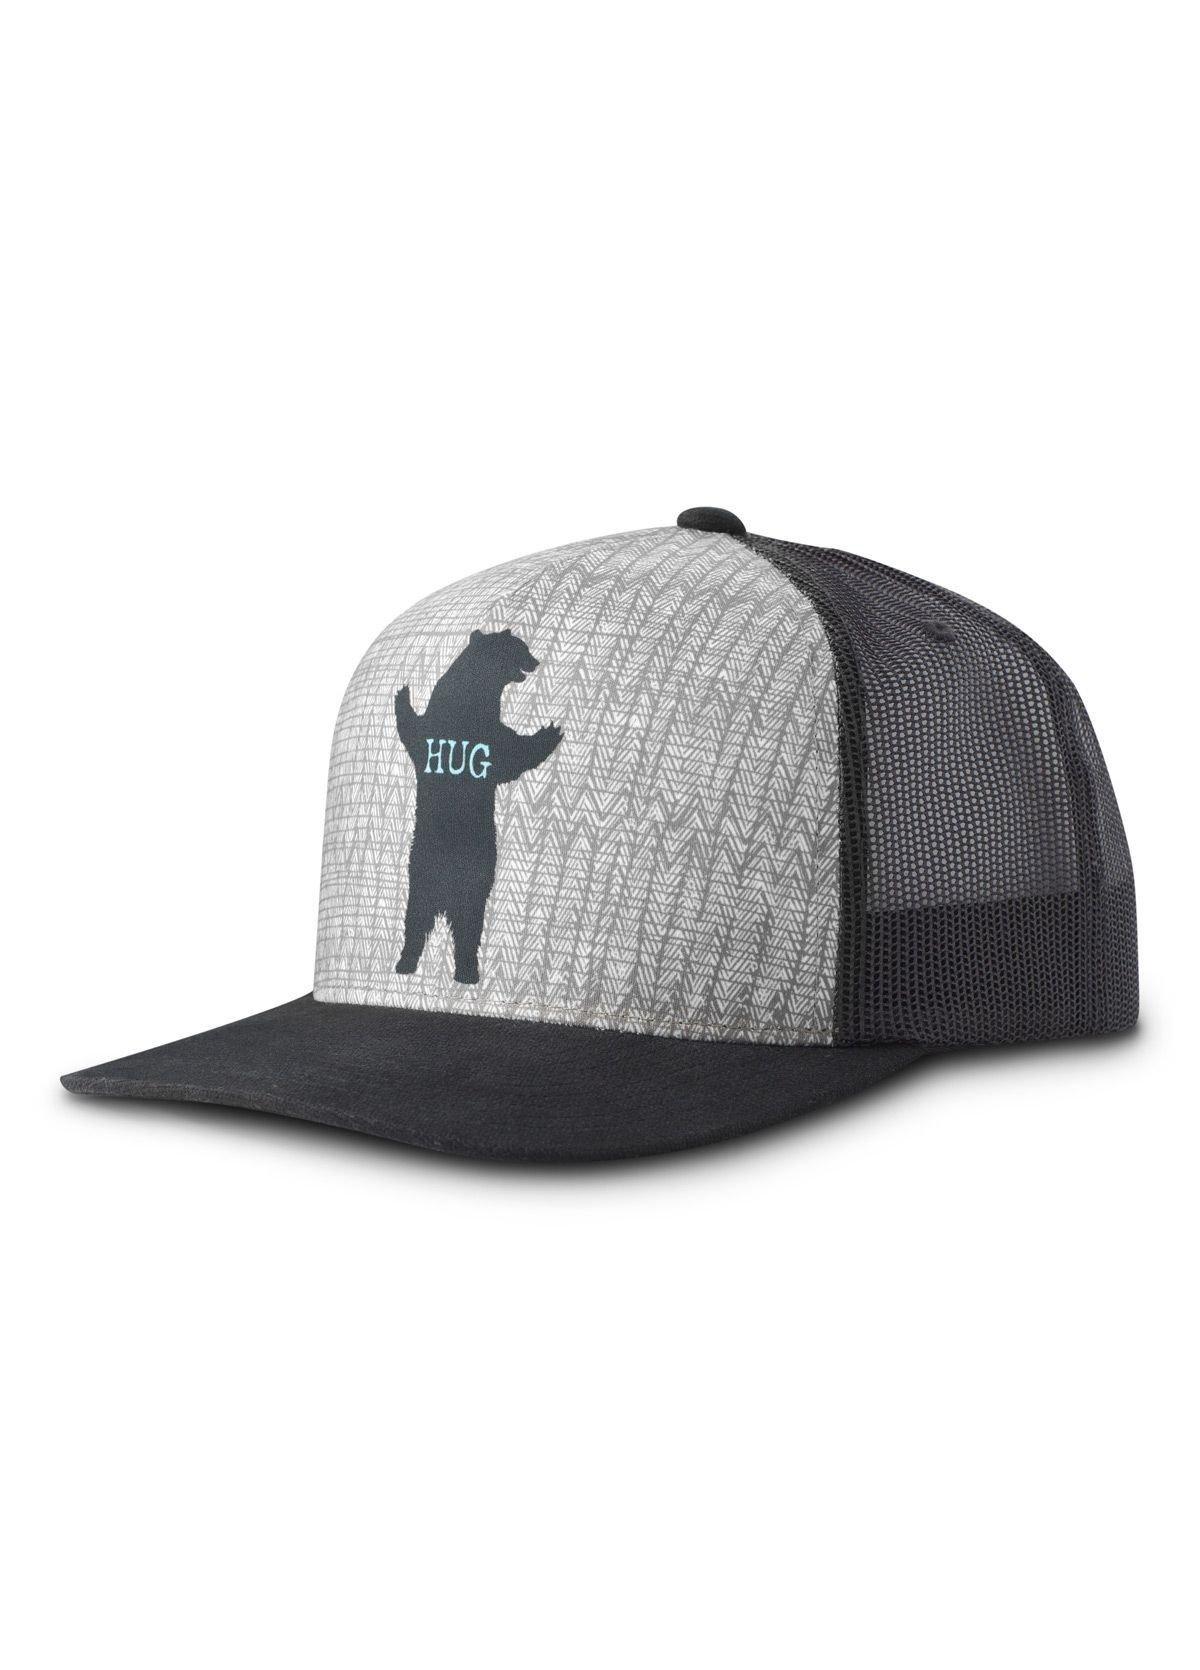 prAna Journeyman Trucker Hat Bear Hug PRJMbear